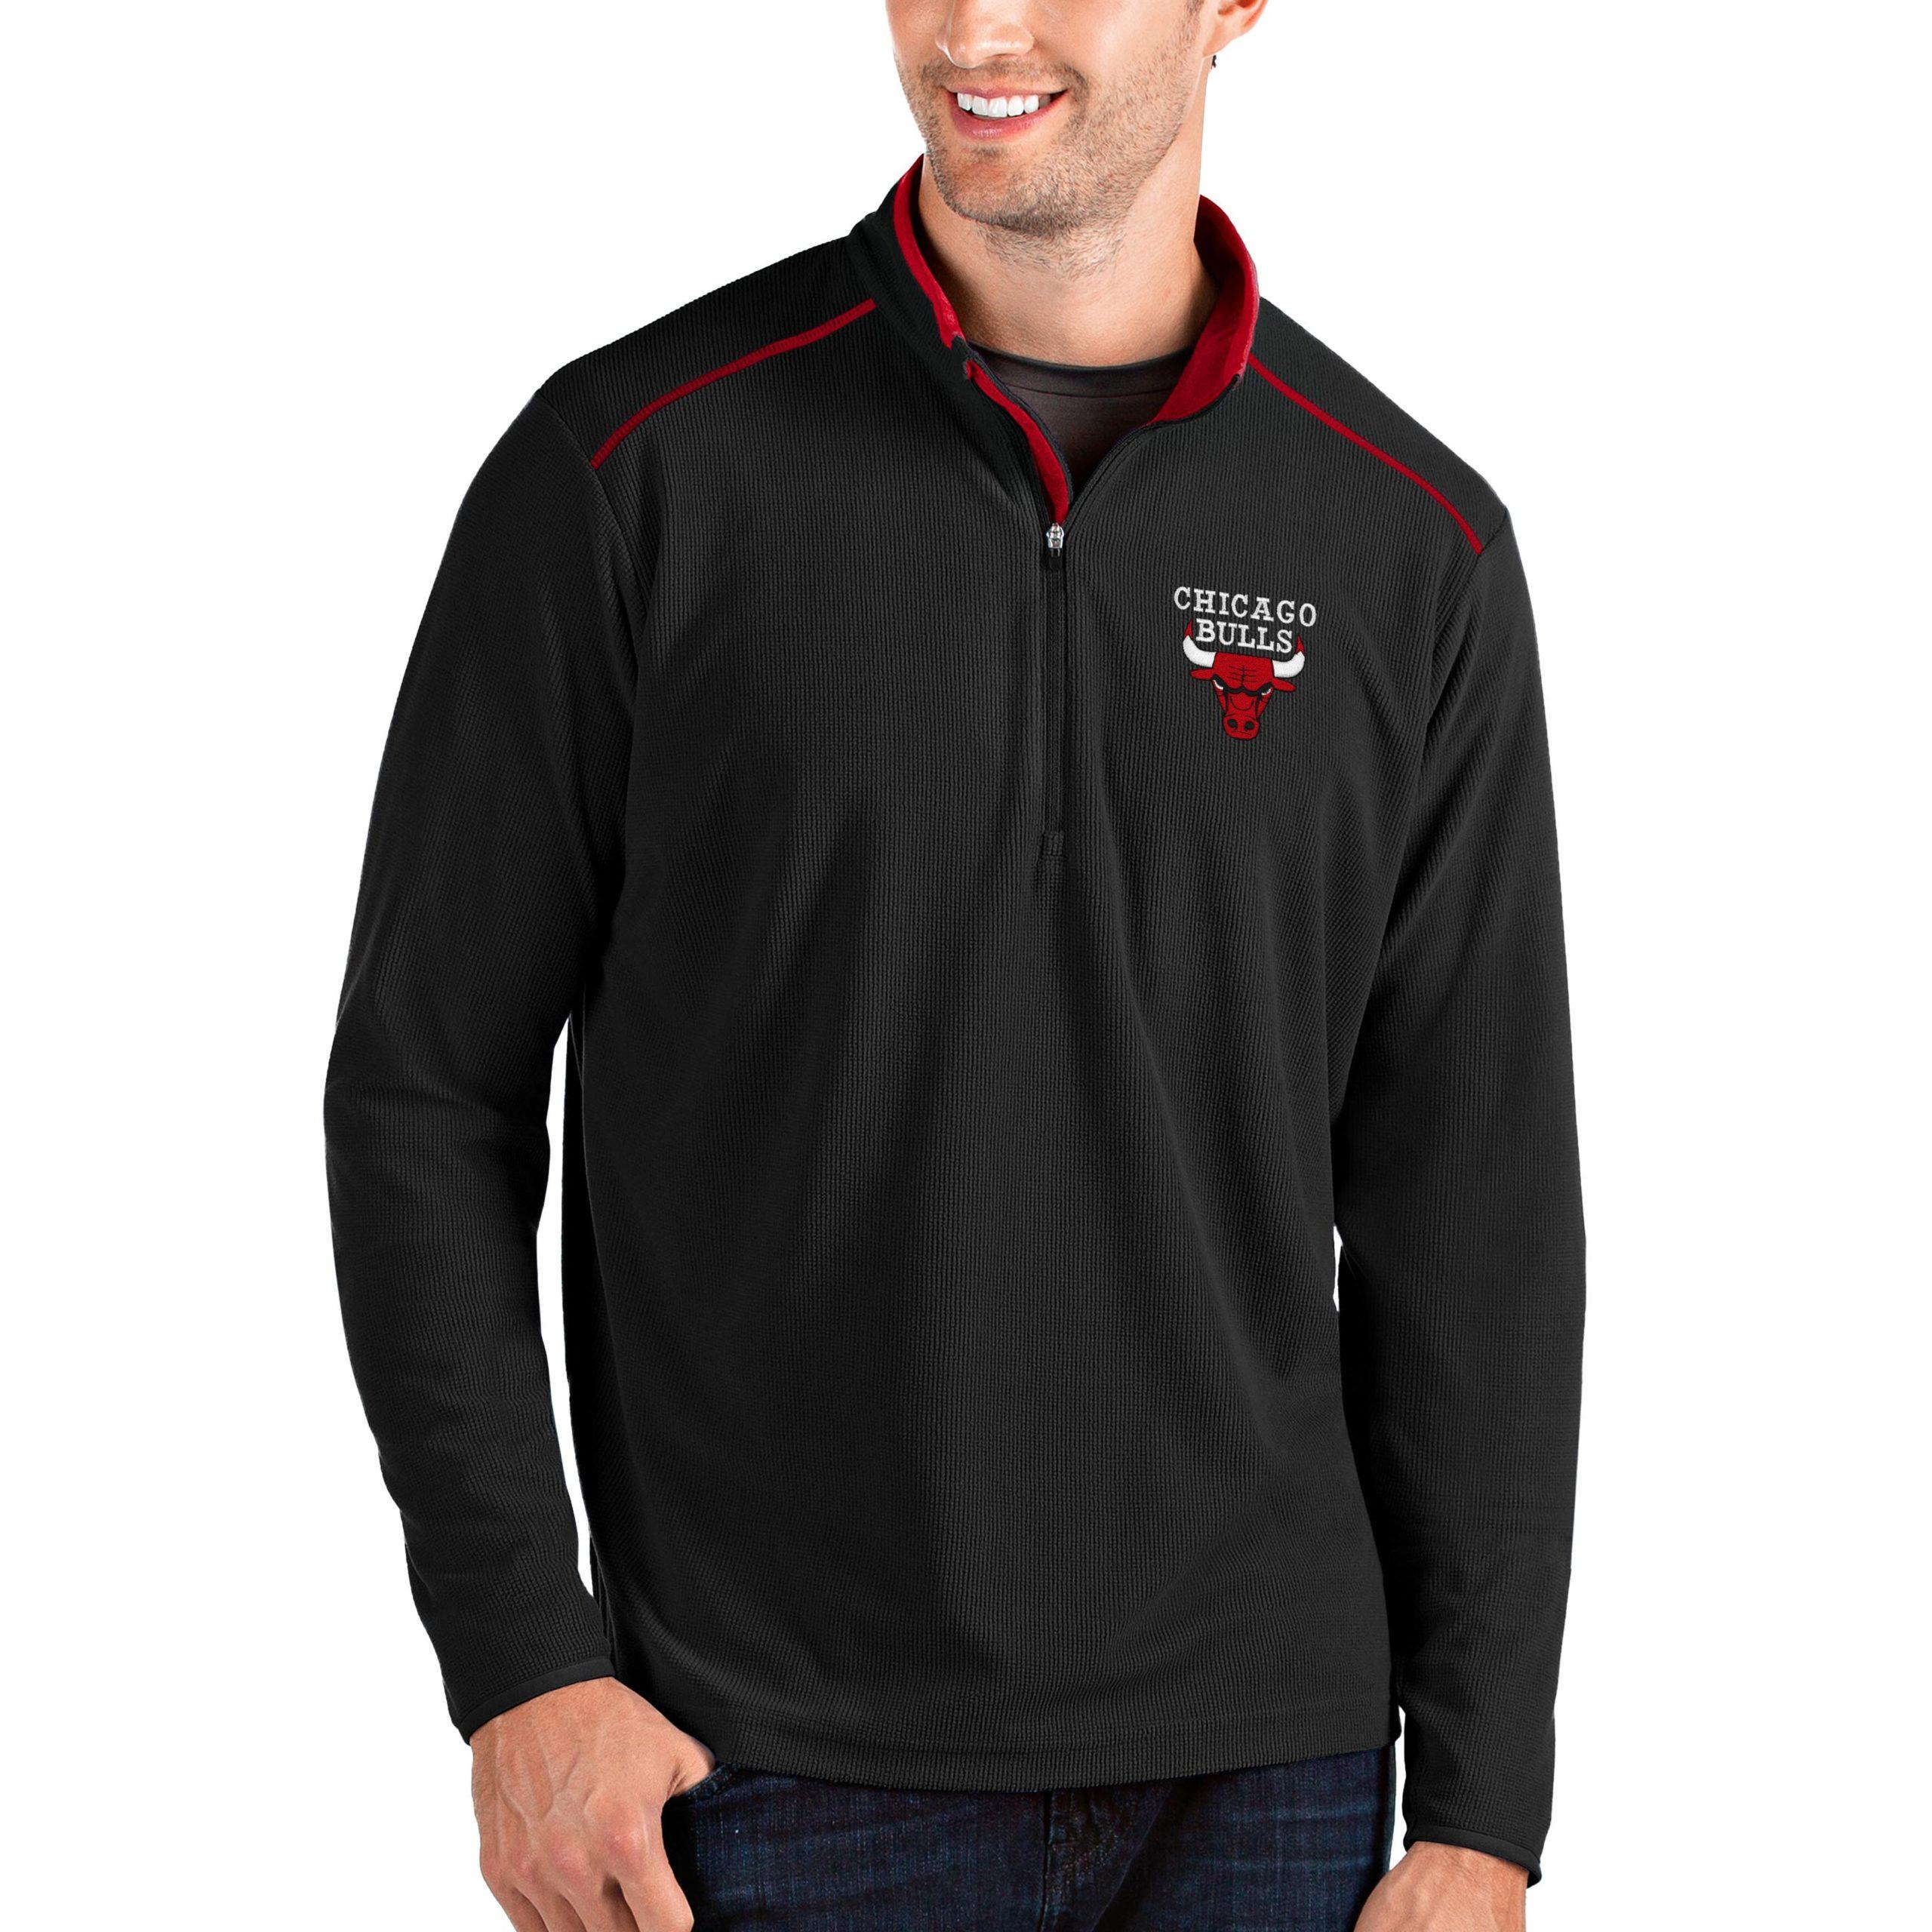 Chicago Bulls Antigua Big & Tall Glacier Quarter-Zip Pullover Jacket - Black/Red